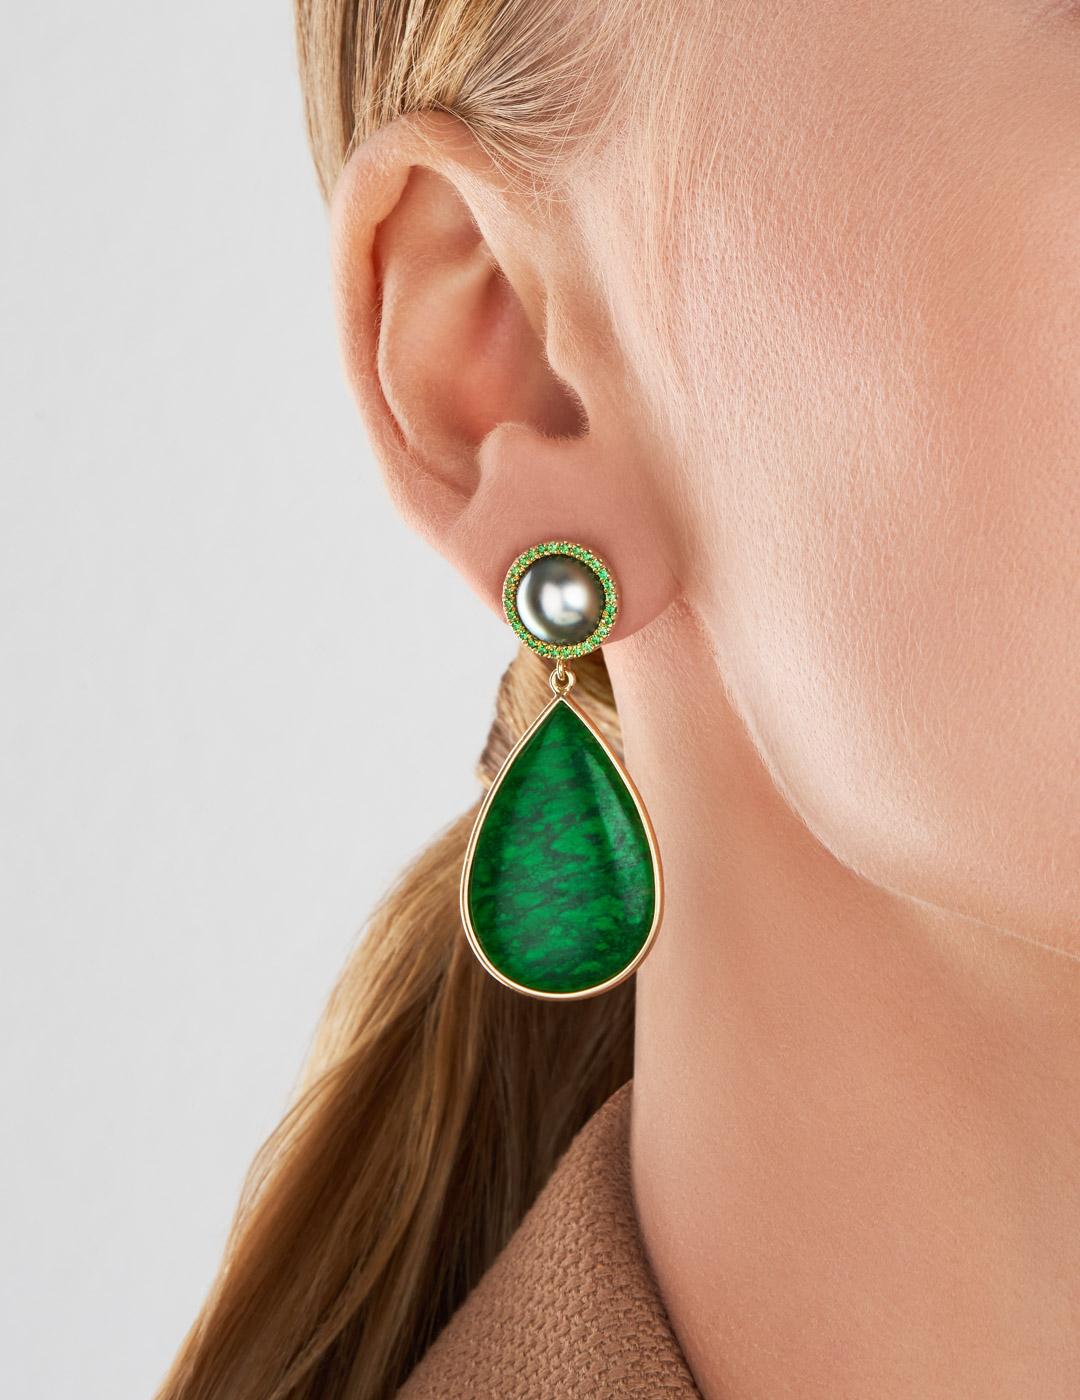 mish_products_earrings_Makena-MawSitSit-ER-2